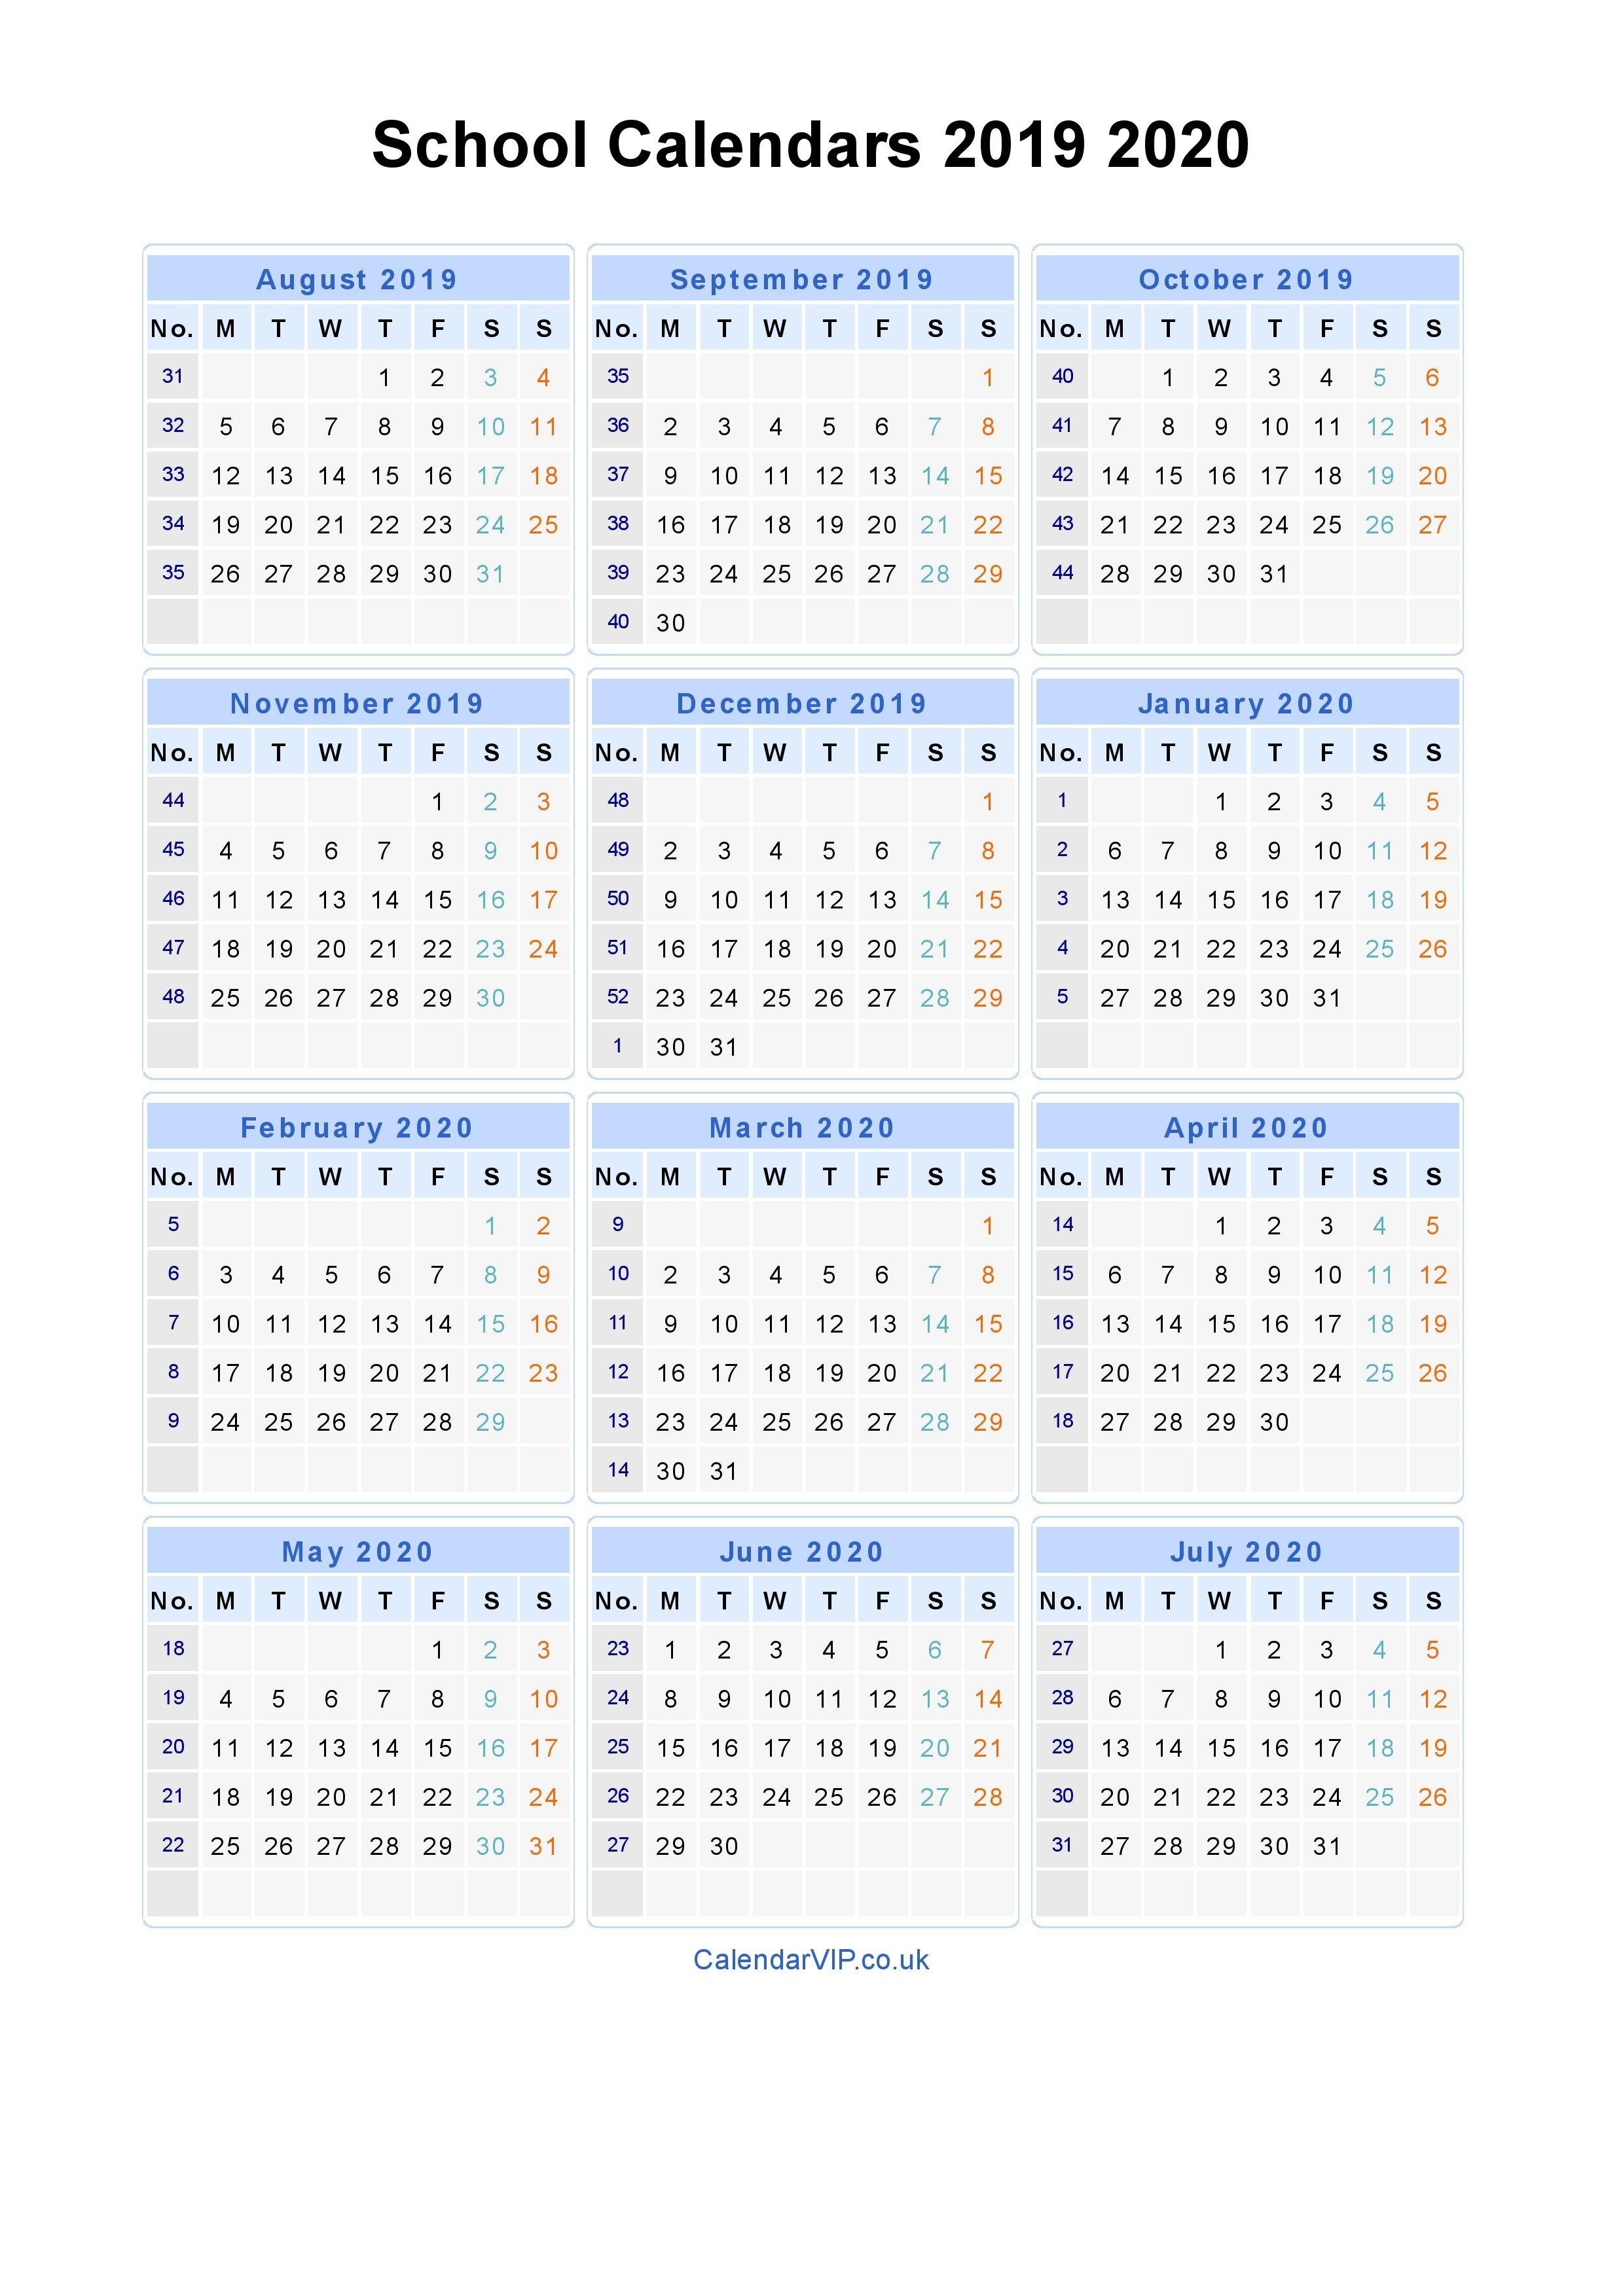 School Calendars 2019 2020 – Calendar From August 2019 To July 2020 Calendar 2019 And 2020